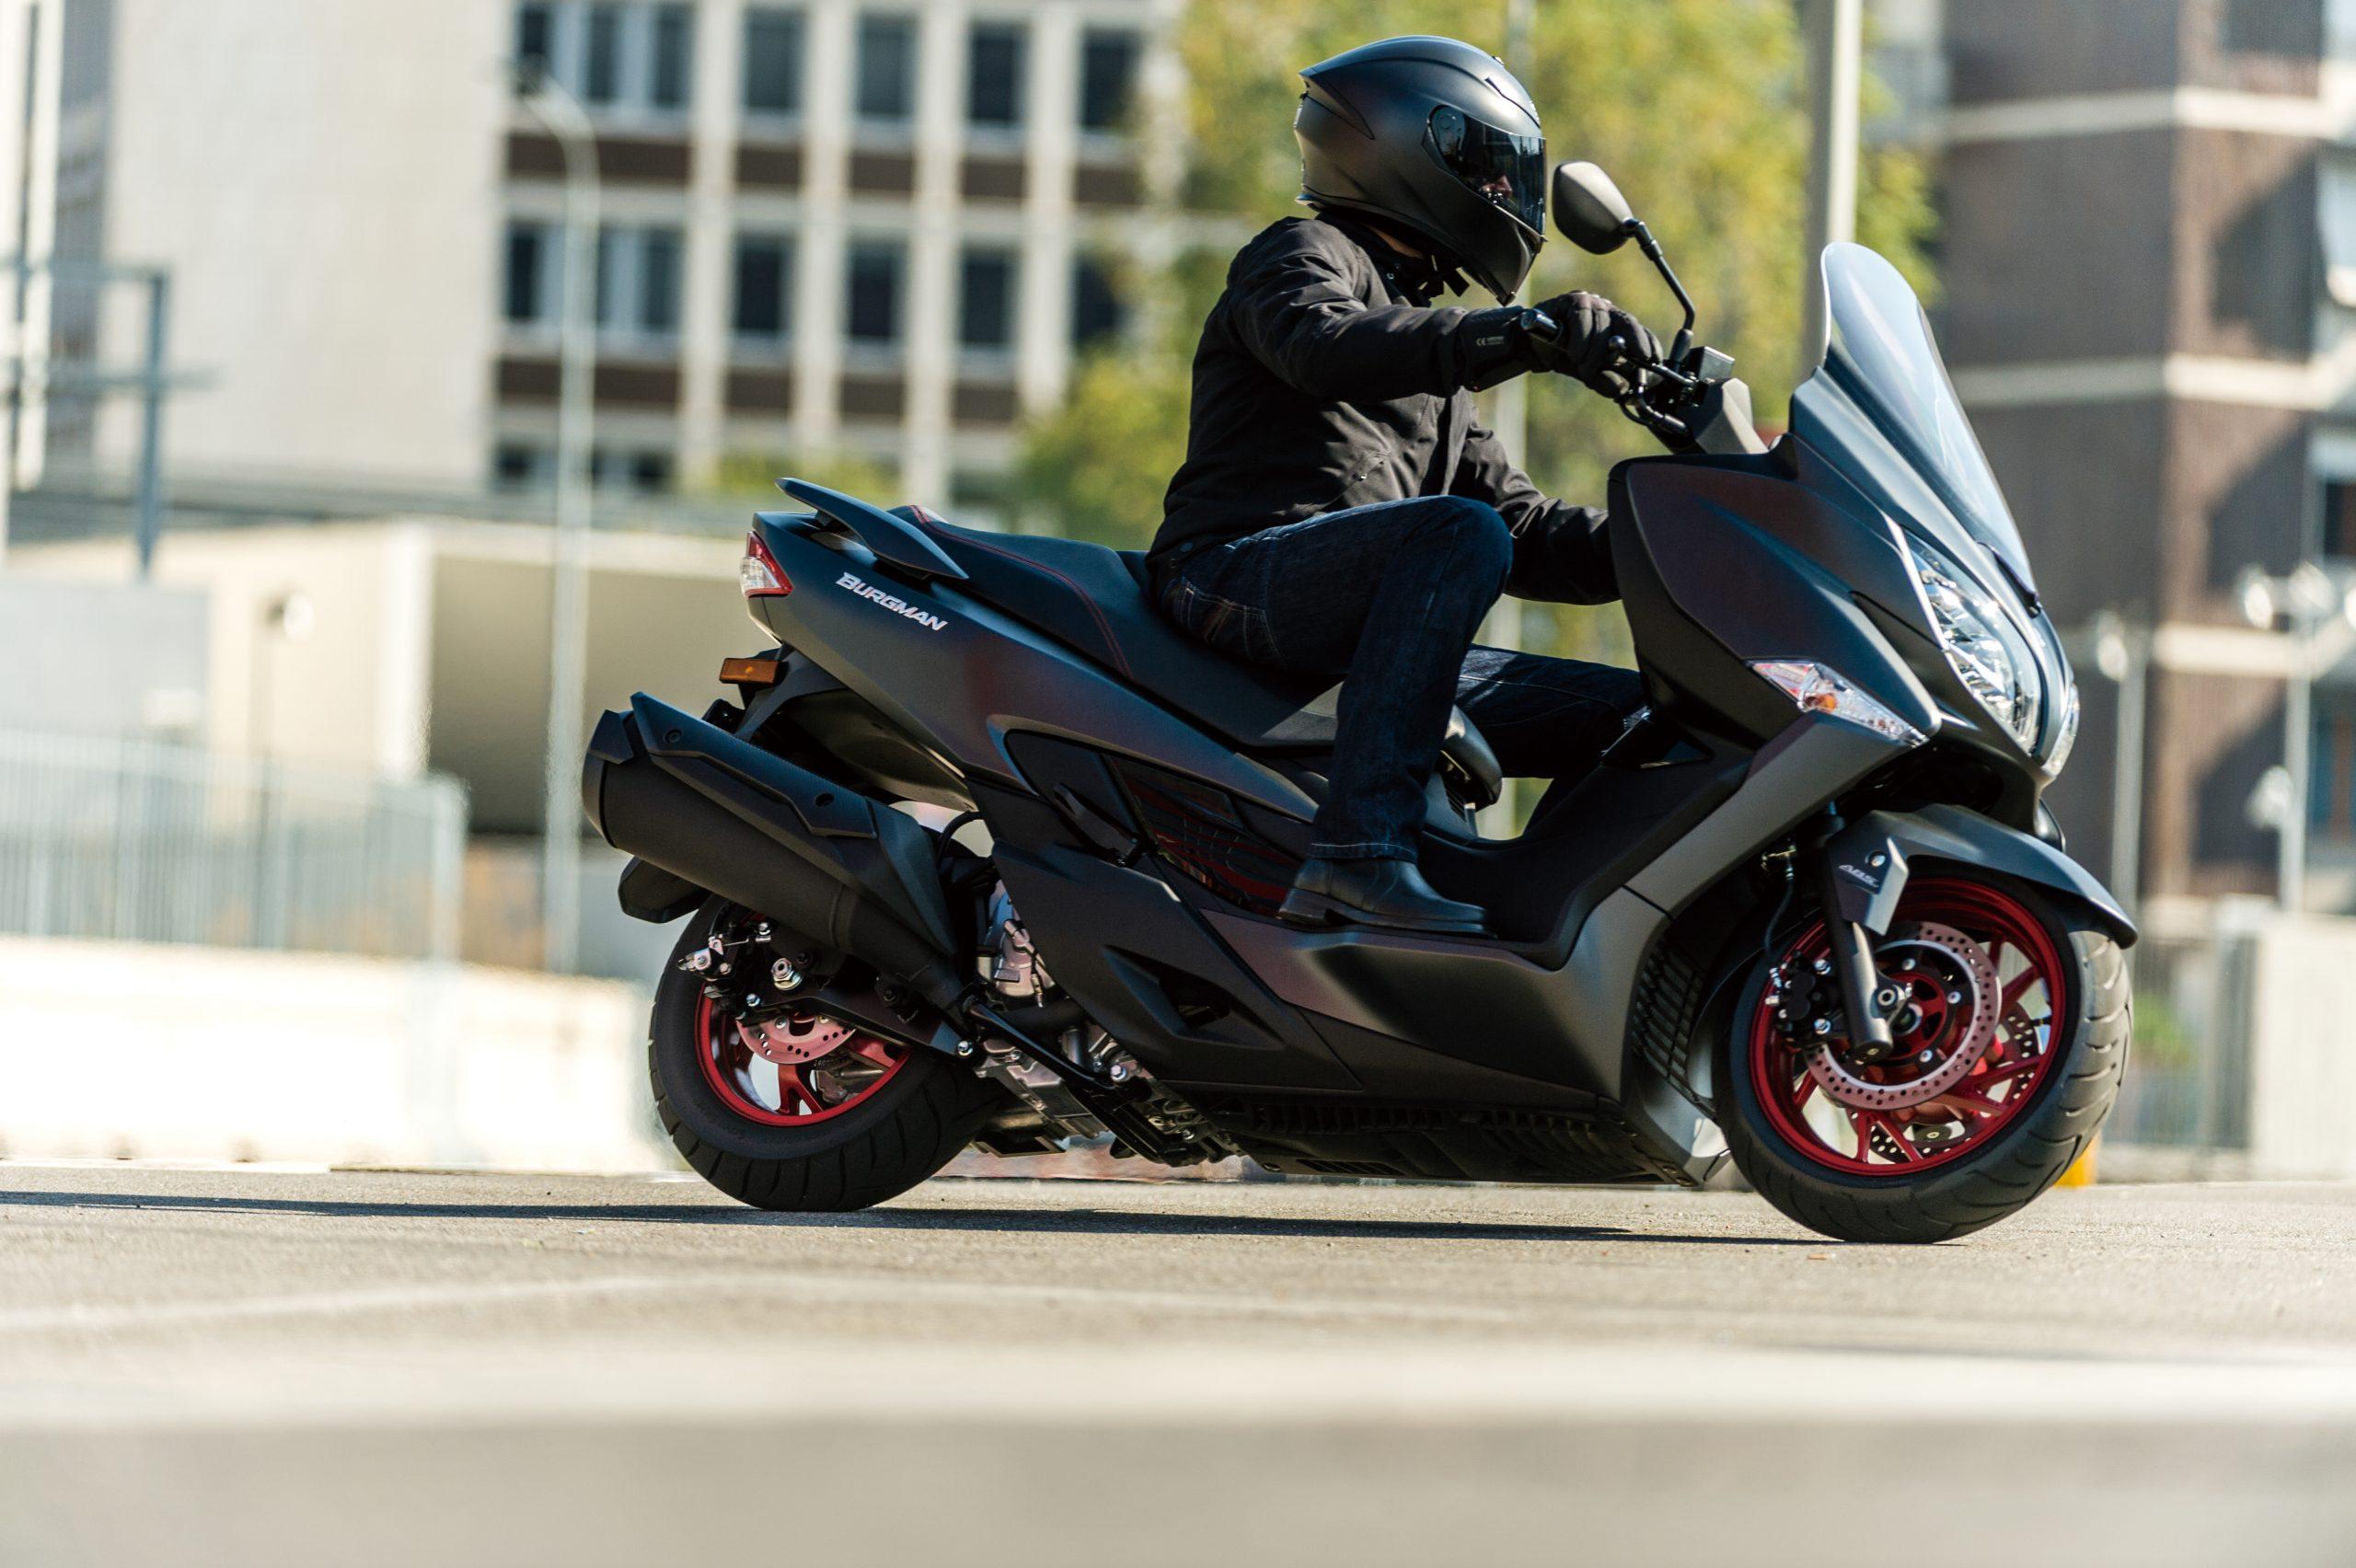 Motorbike types, maxi-scooter, Suzuki Burgman